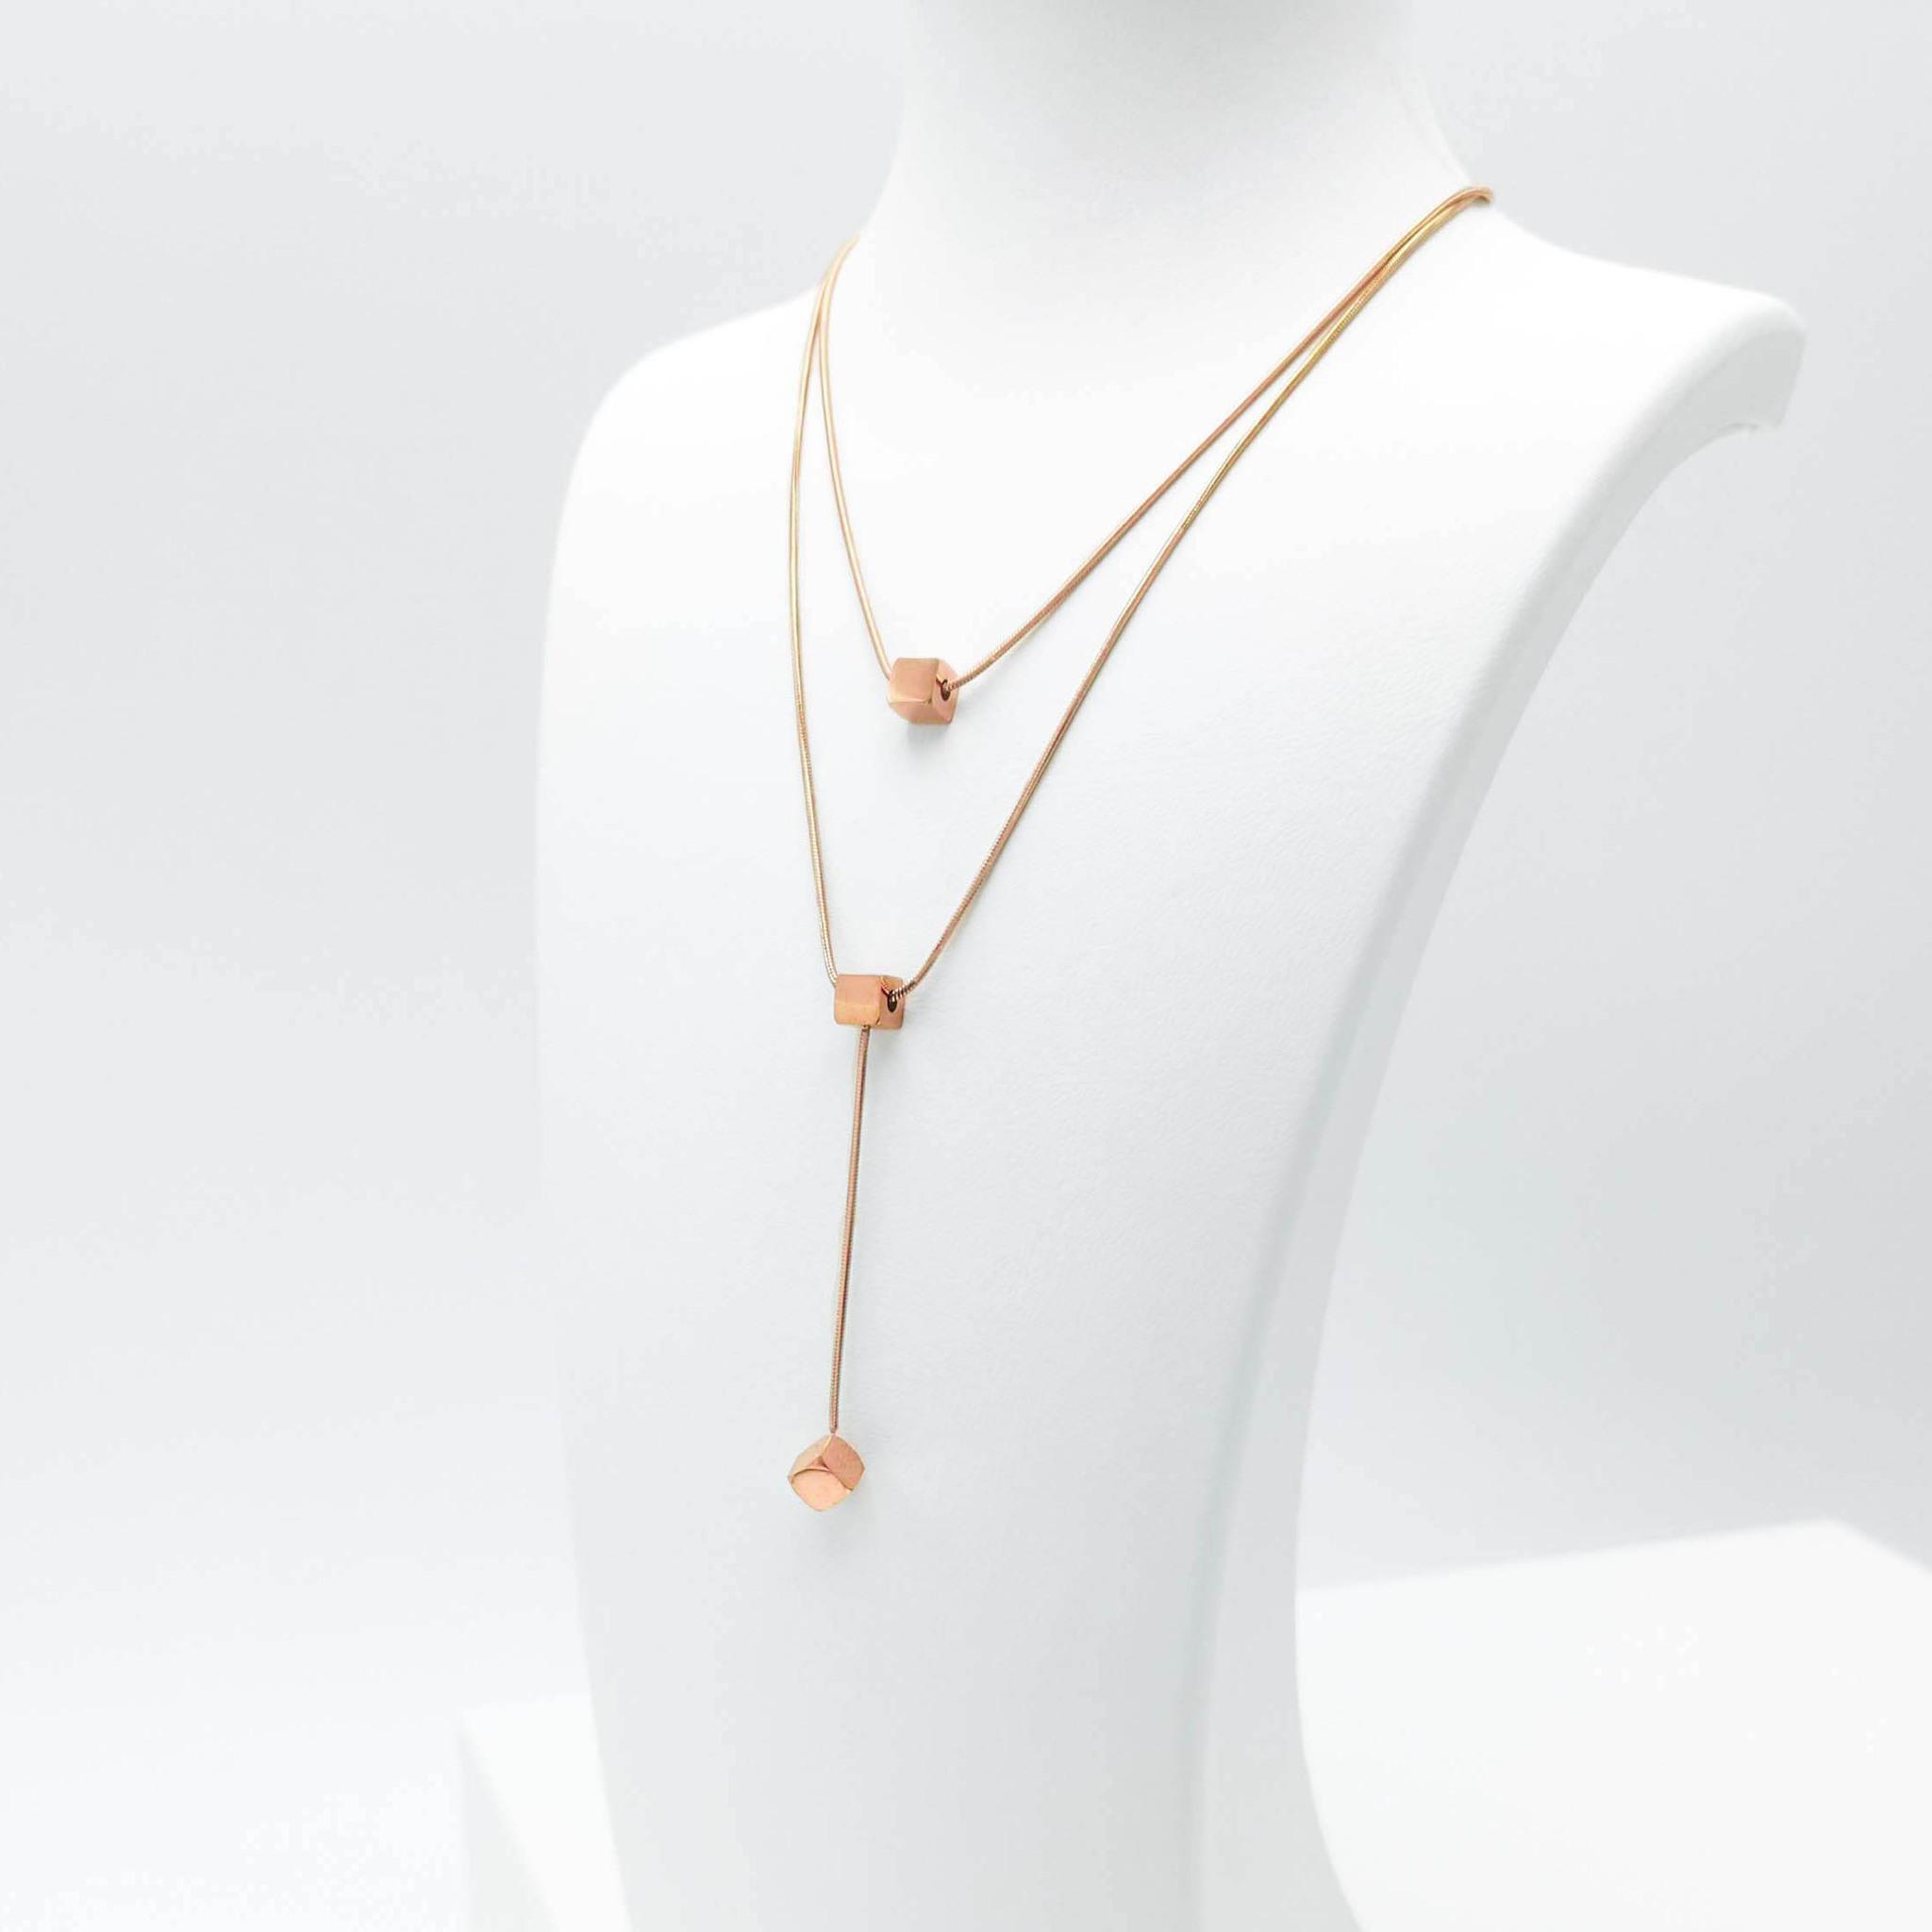 2 Charisma Luck Orbits Dam halsband. Modern, stilren och exklusive Smycke.